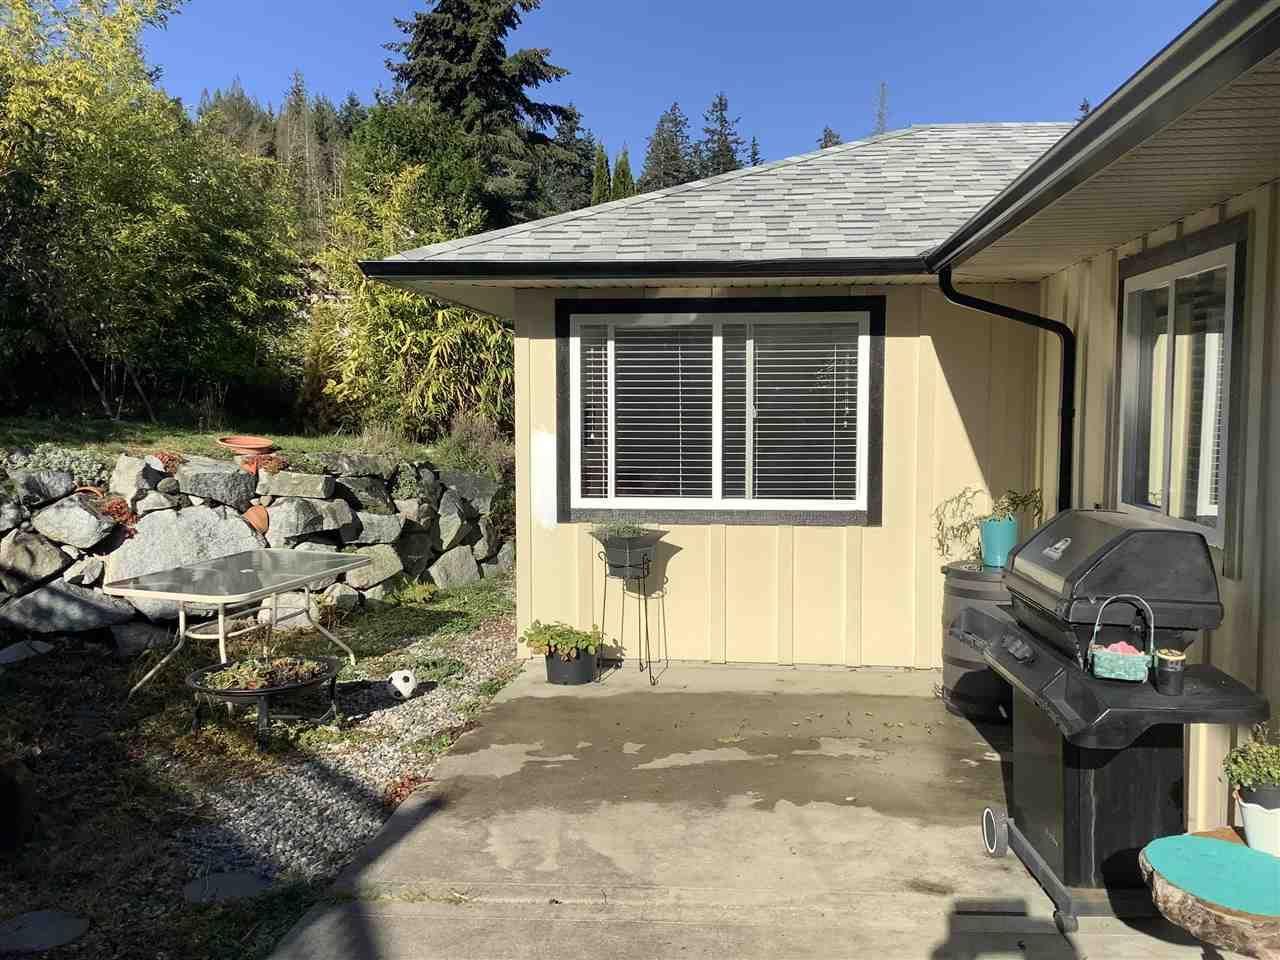 Main Photo: 5589 MEDUSA Place in Sechelt: Sechelt District House for sale (Sunshine Coast)  : MLS®# R2515689